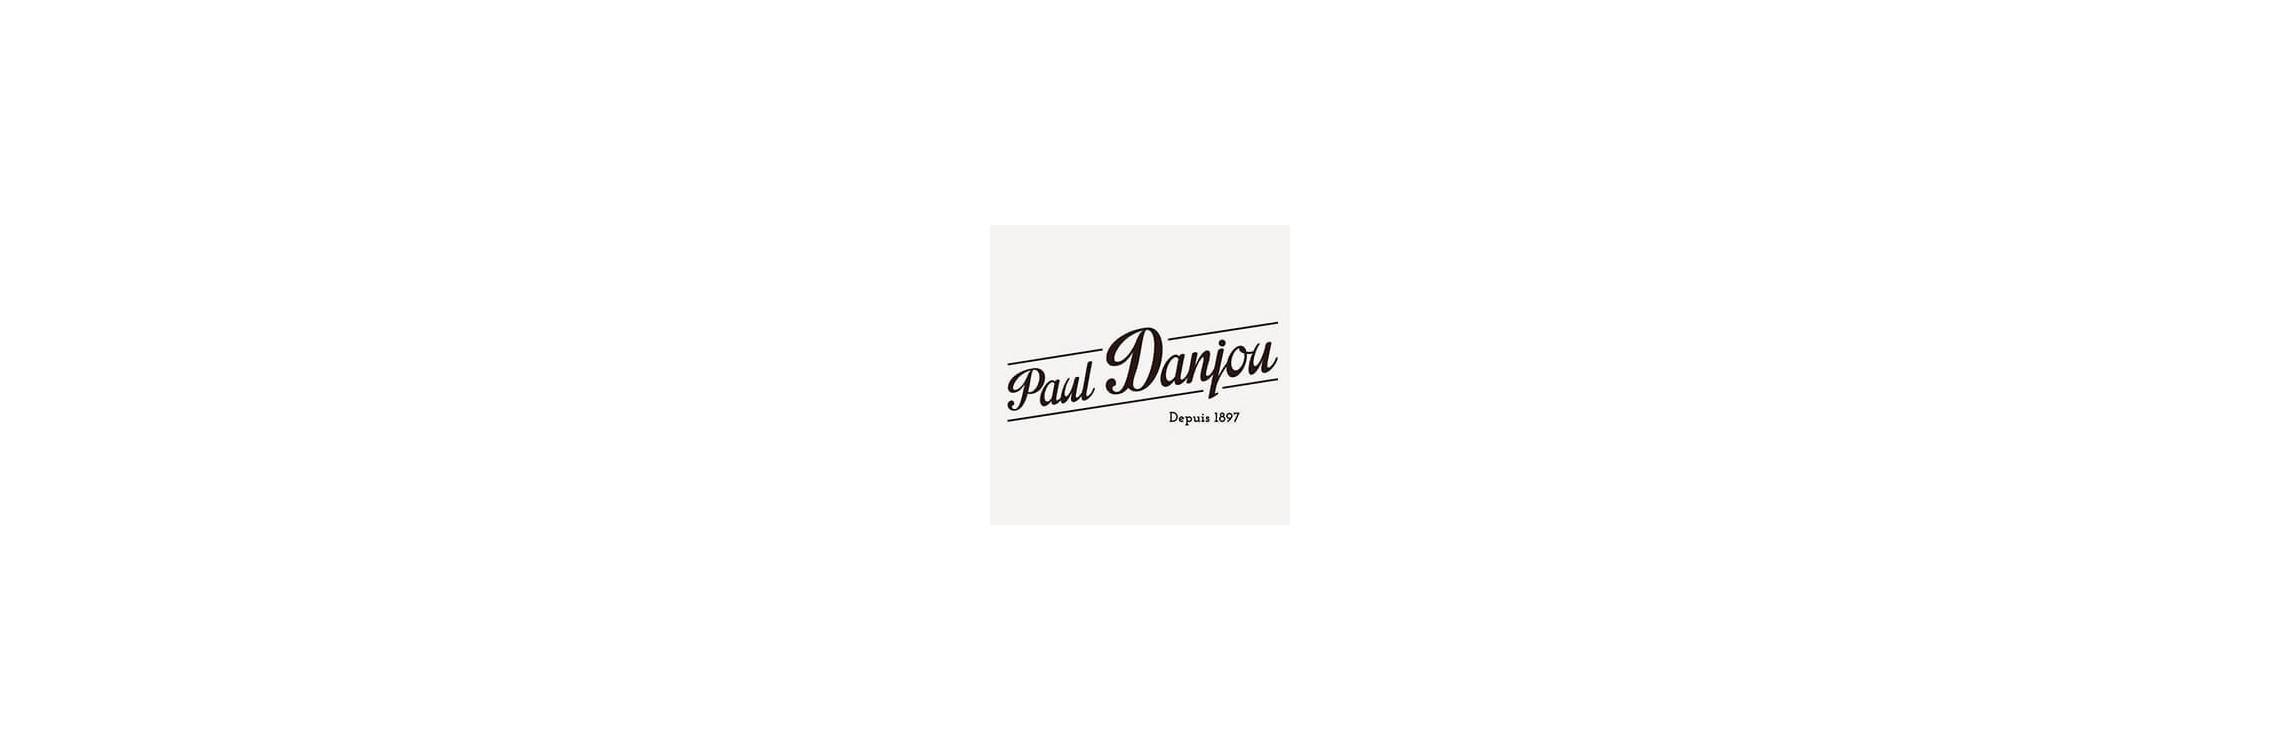 Andouille Paul Danjou